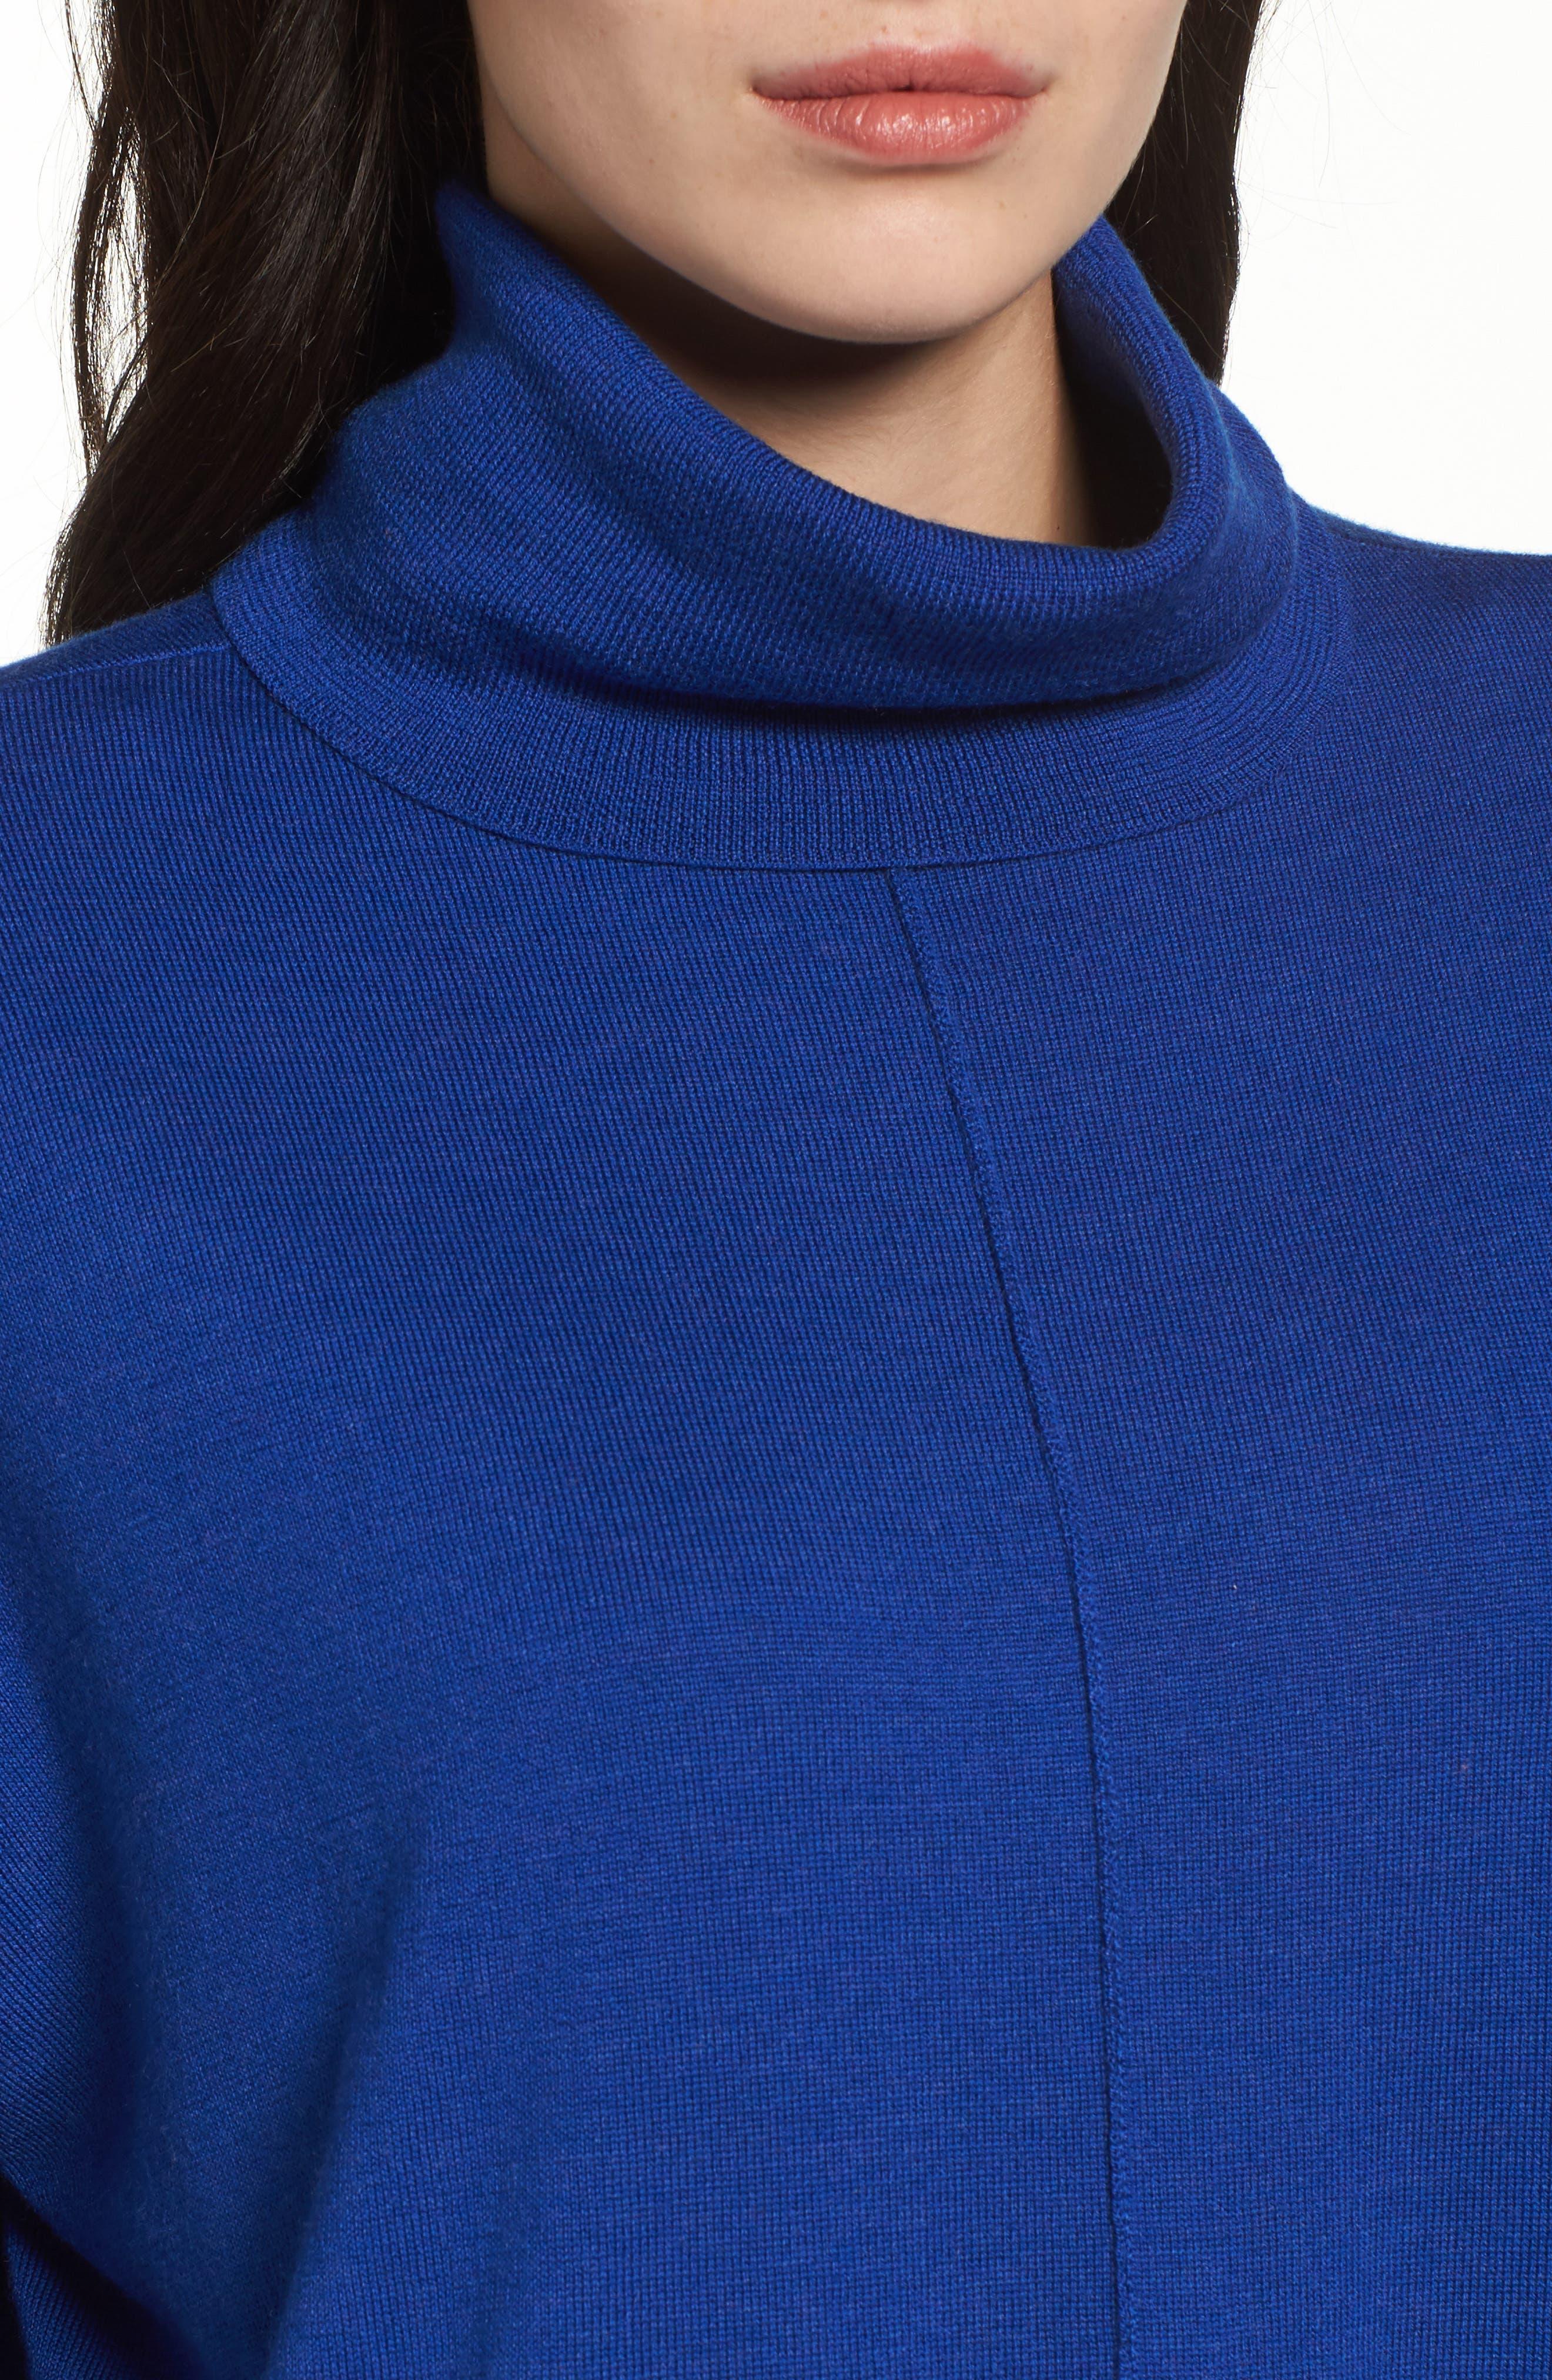 Merino Wool Boxy Turtleneck Sweater,                             Alternate thumbnail 22, color,